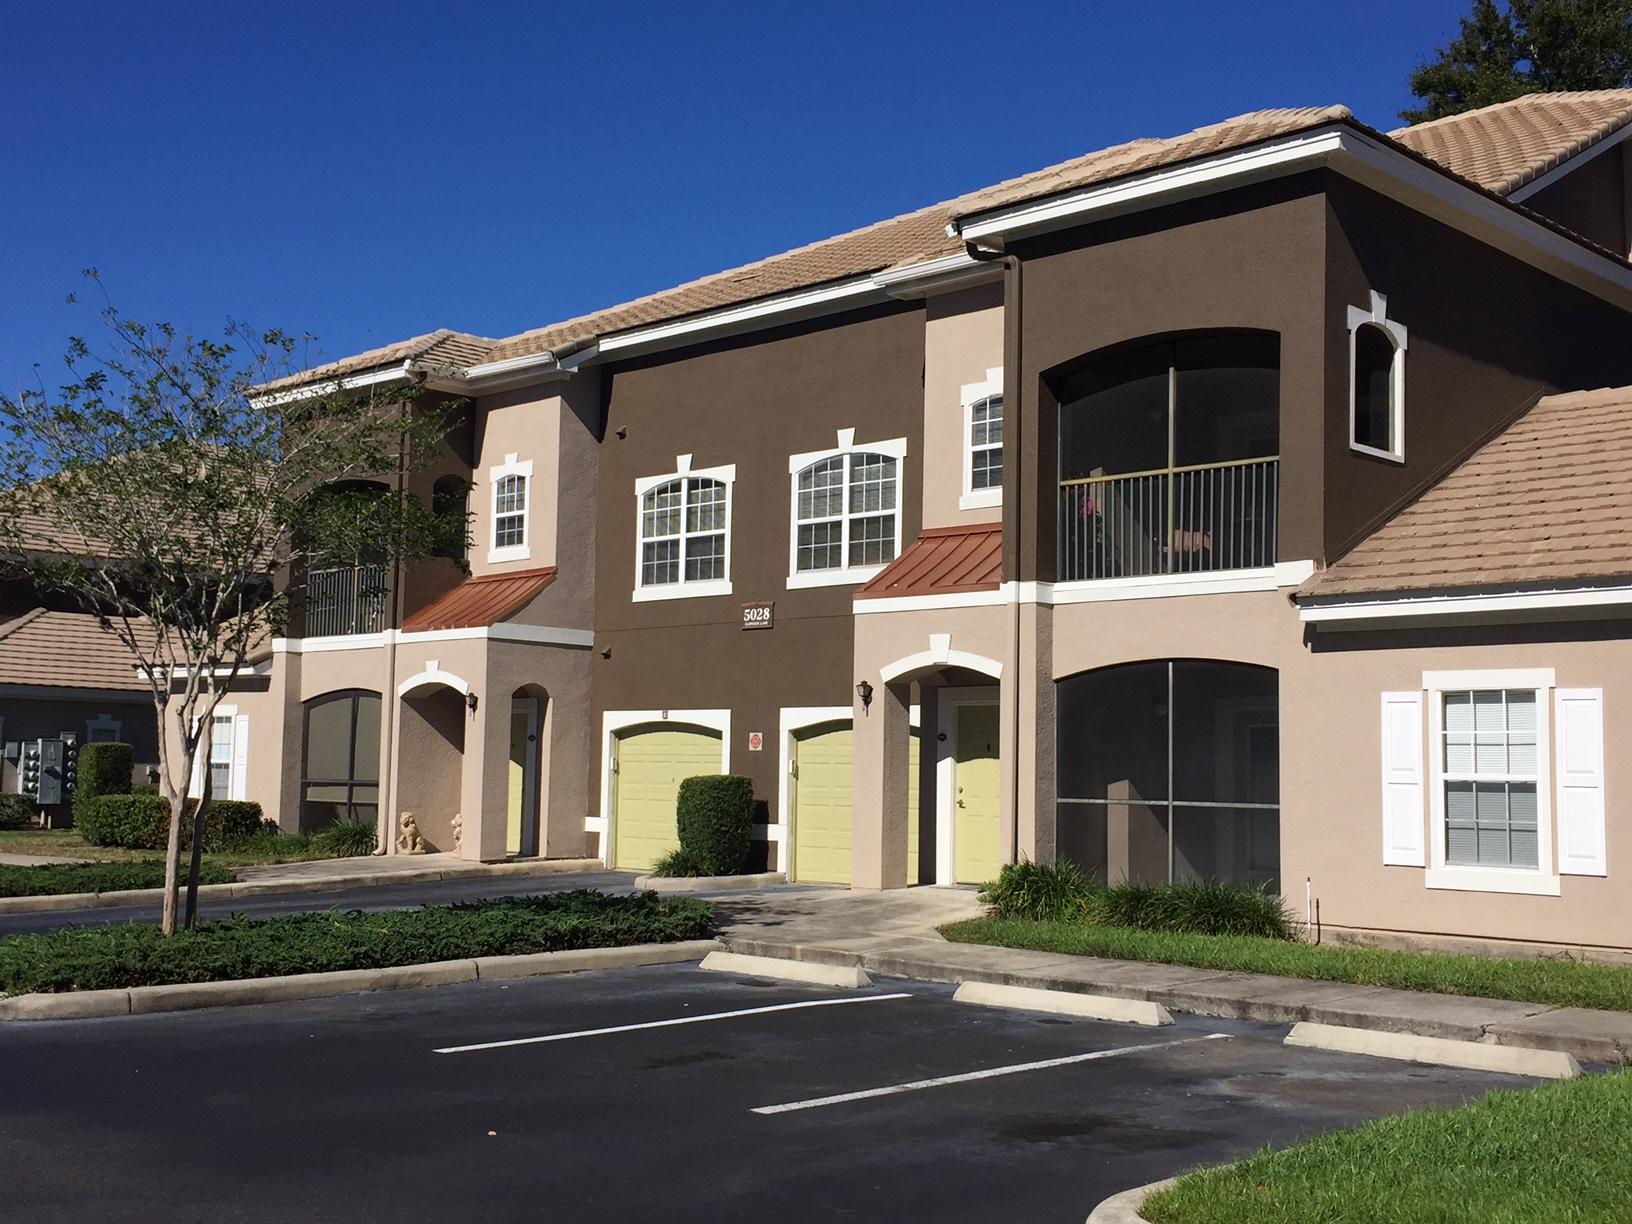 Ballantrae apartment in Sanford FL